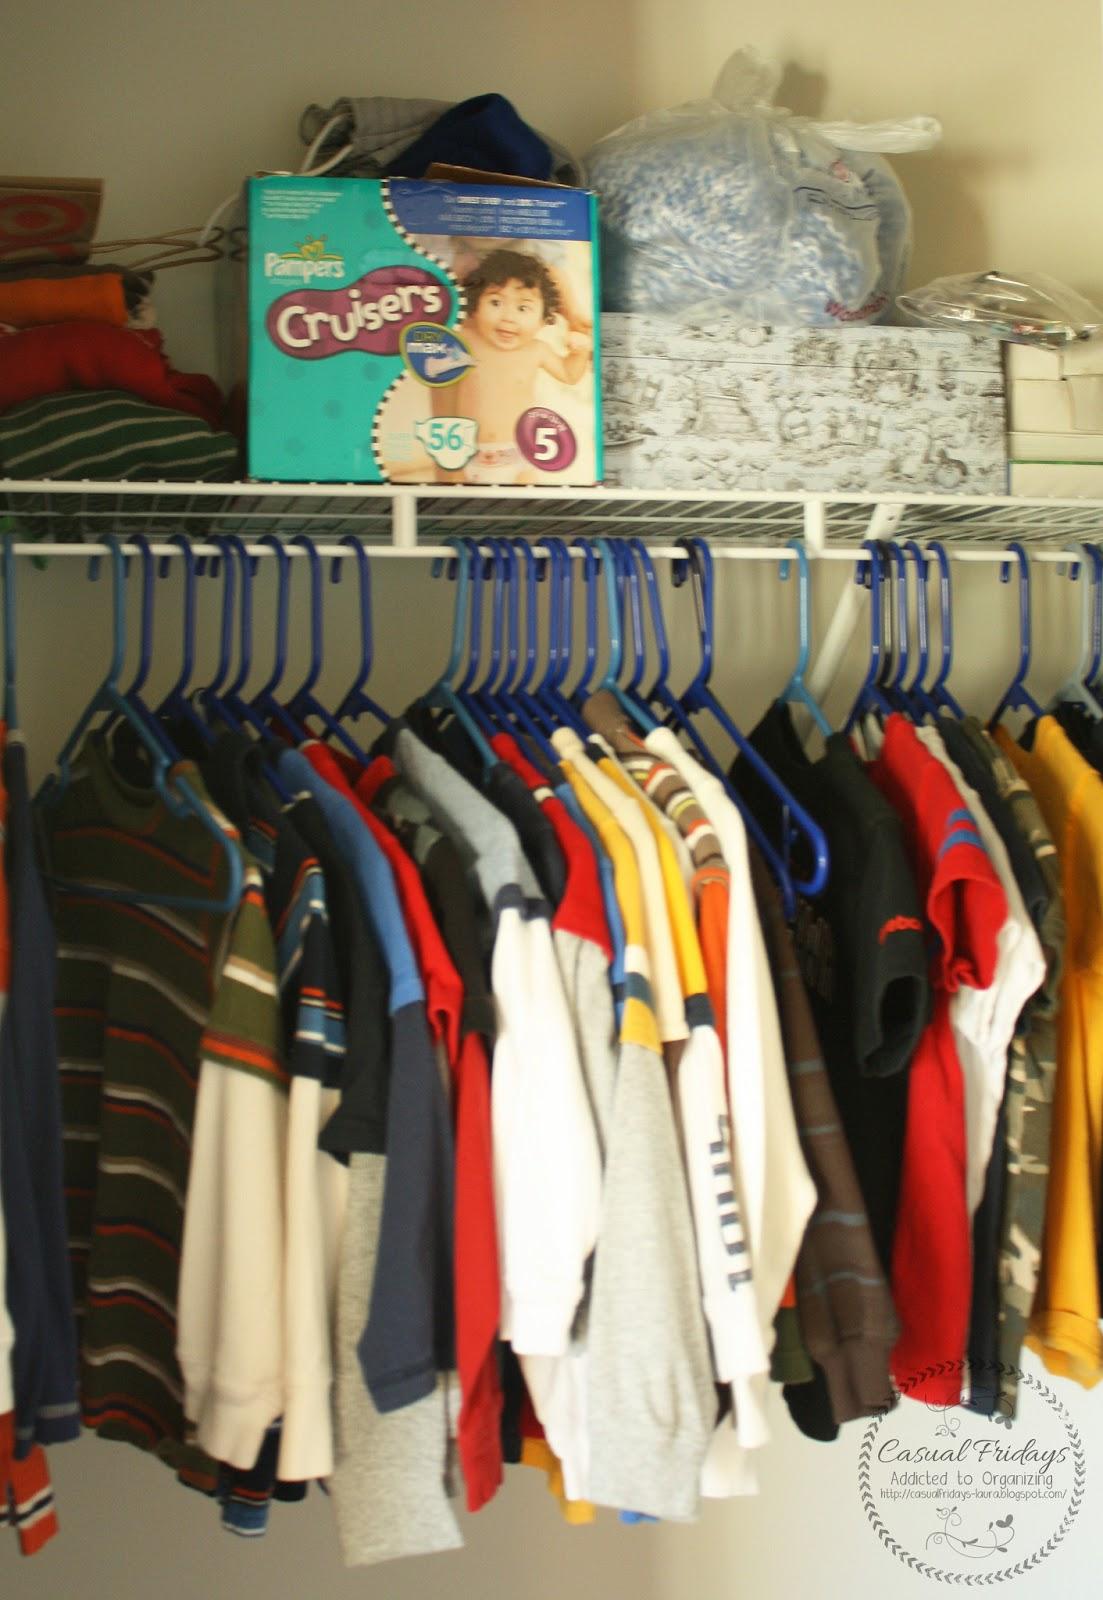 Casual Fridays: Organizing the Boys Closet - Preview